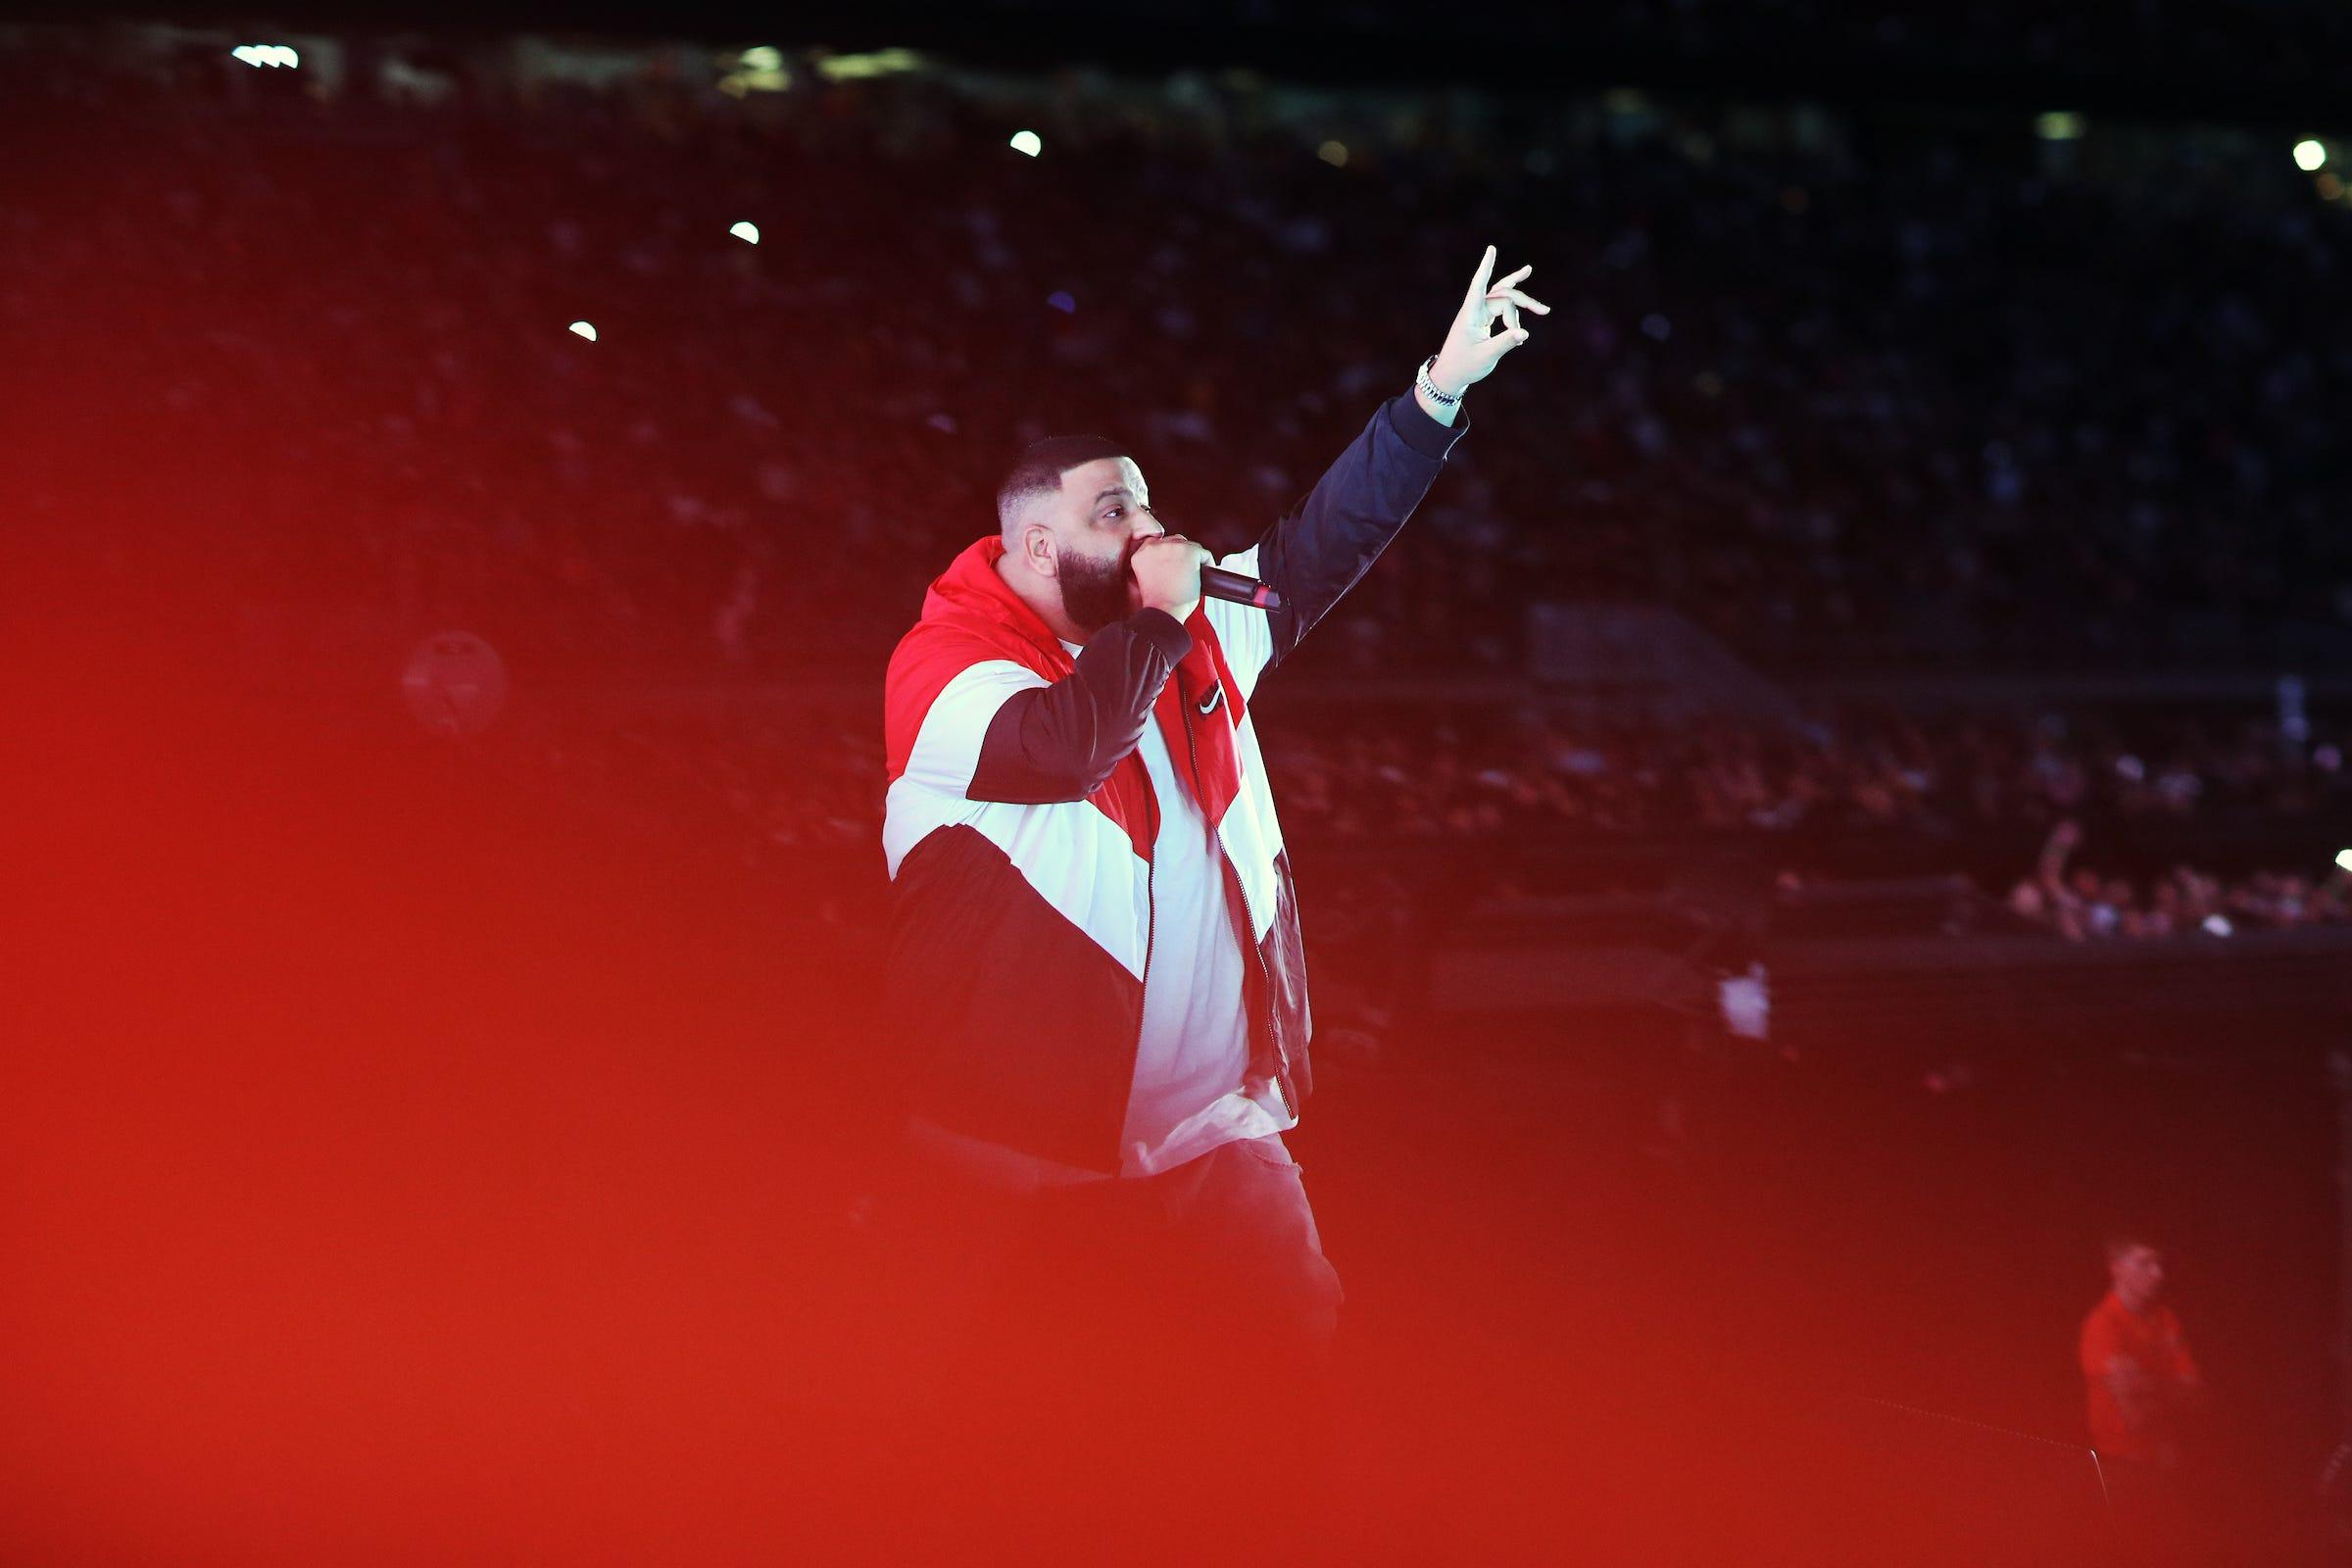 DJ Khaled performs during the 'On The Run II' tour at the University of Phoenix Stadium on Sept. 19, 2018 in Phoenix, Arizona.